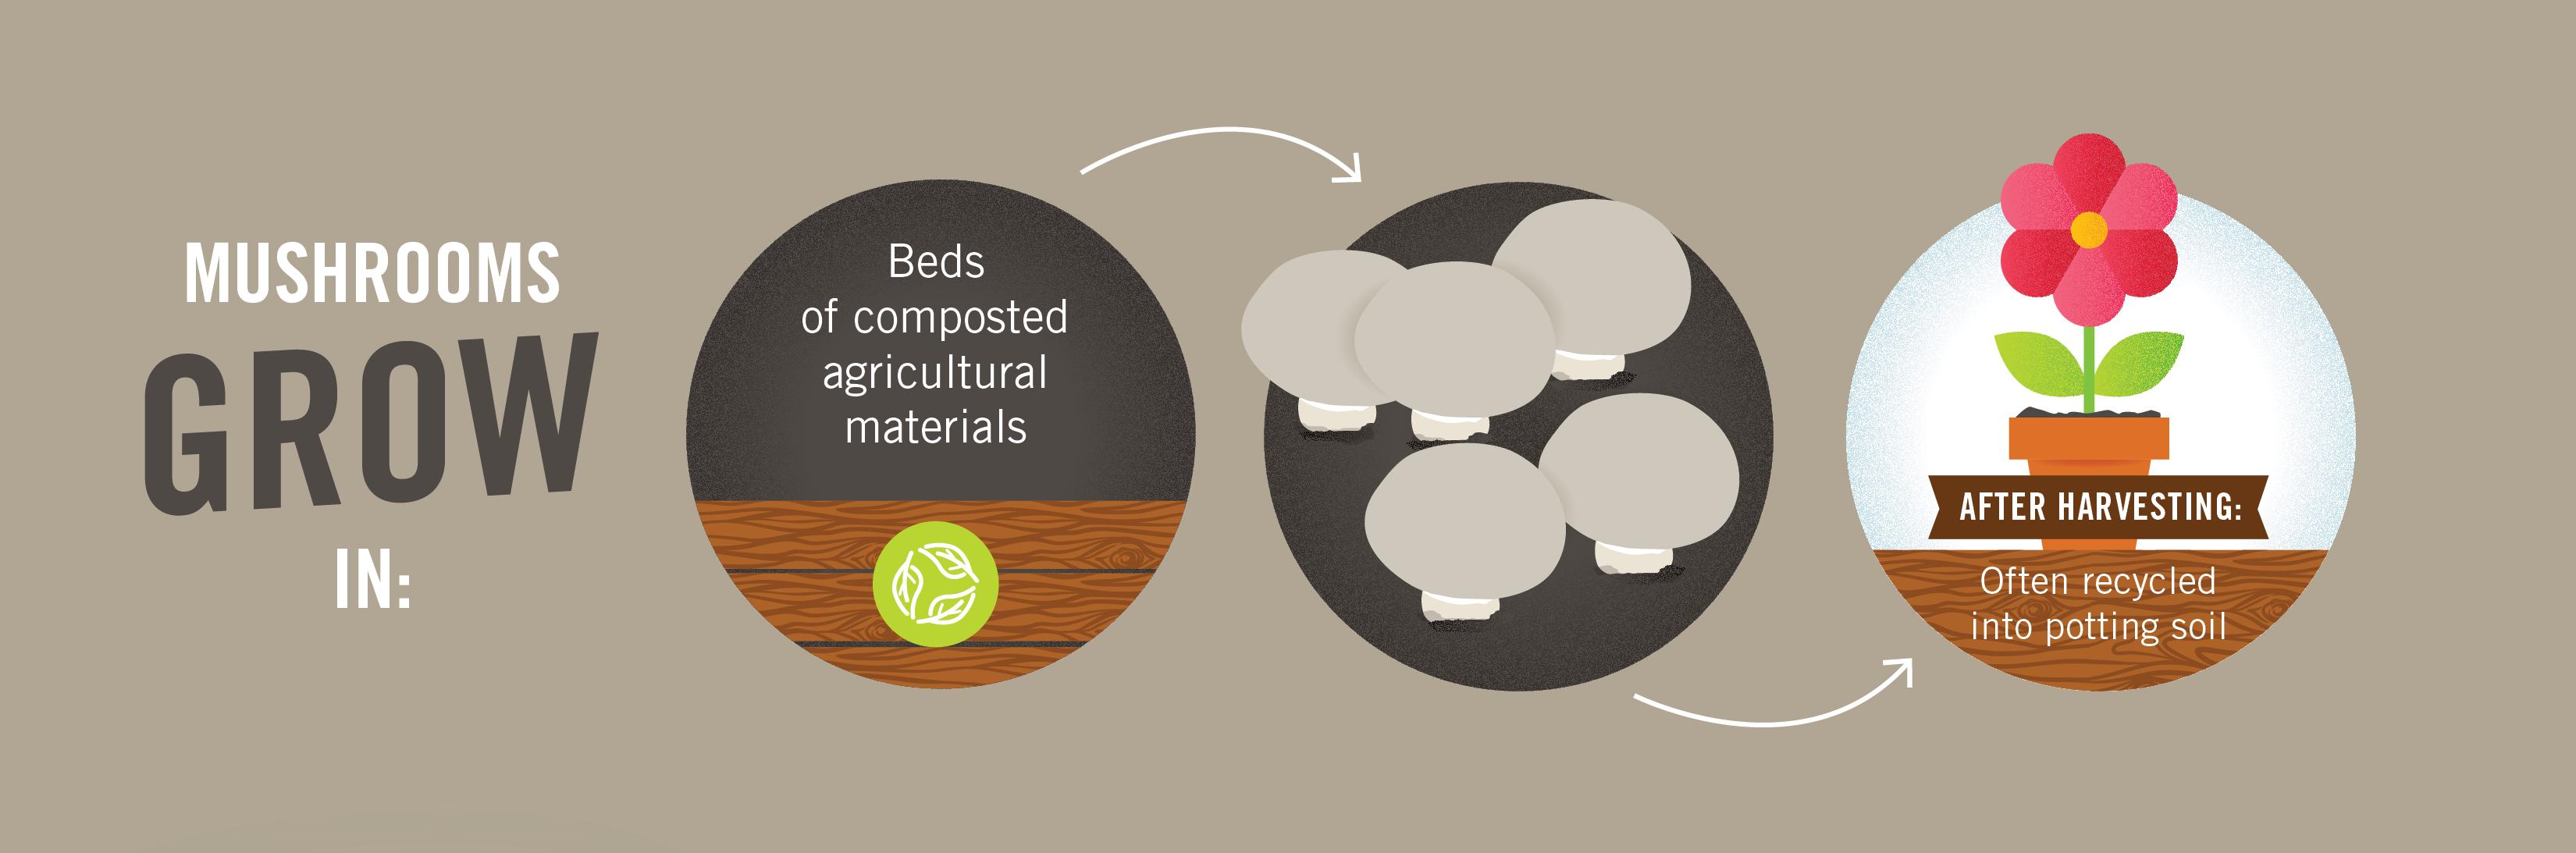 Mushroom Sustainability Story 11x17-02.png